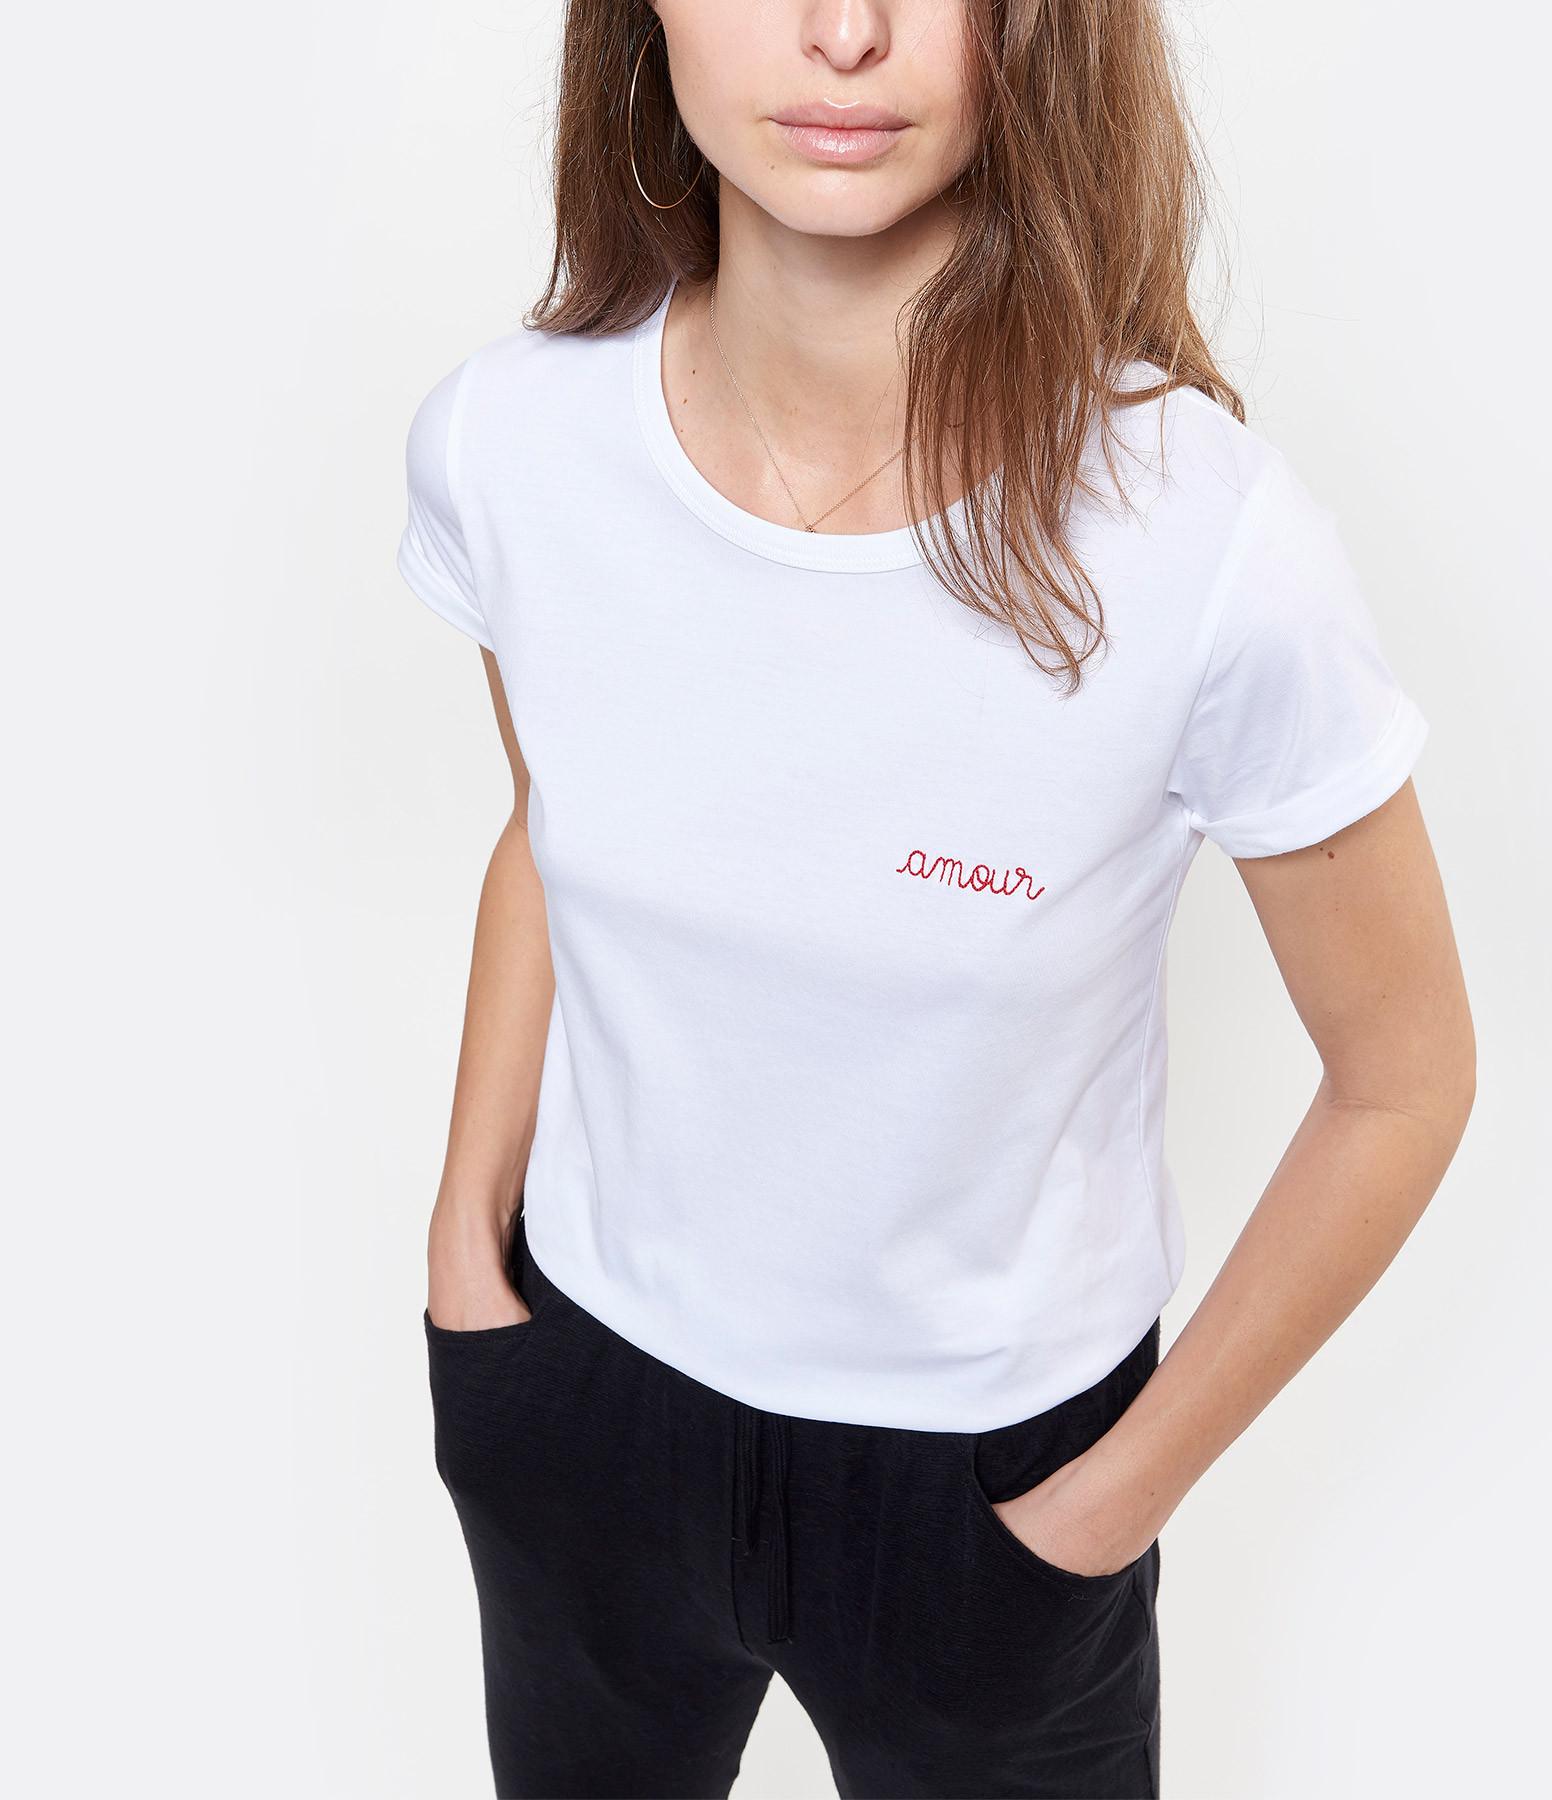 MAISON LABICHE - Tee-shirt Amour Blanc Rouge